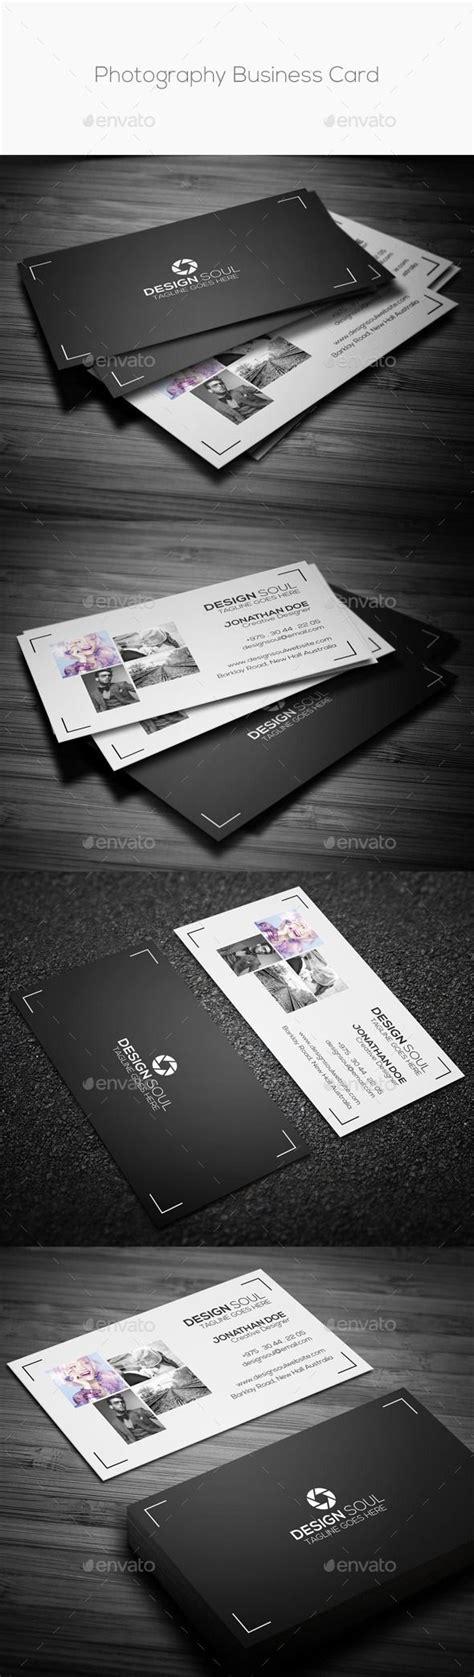 photographer business card psd template v1 best 25 photography business cards ideas on